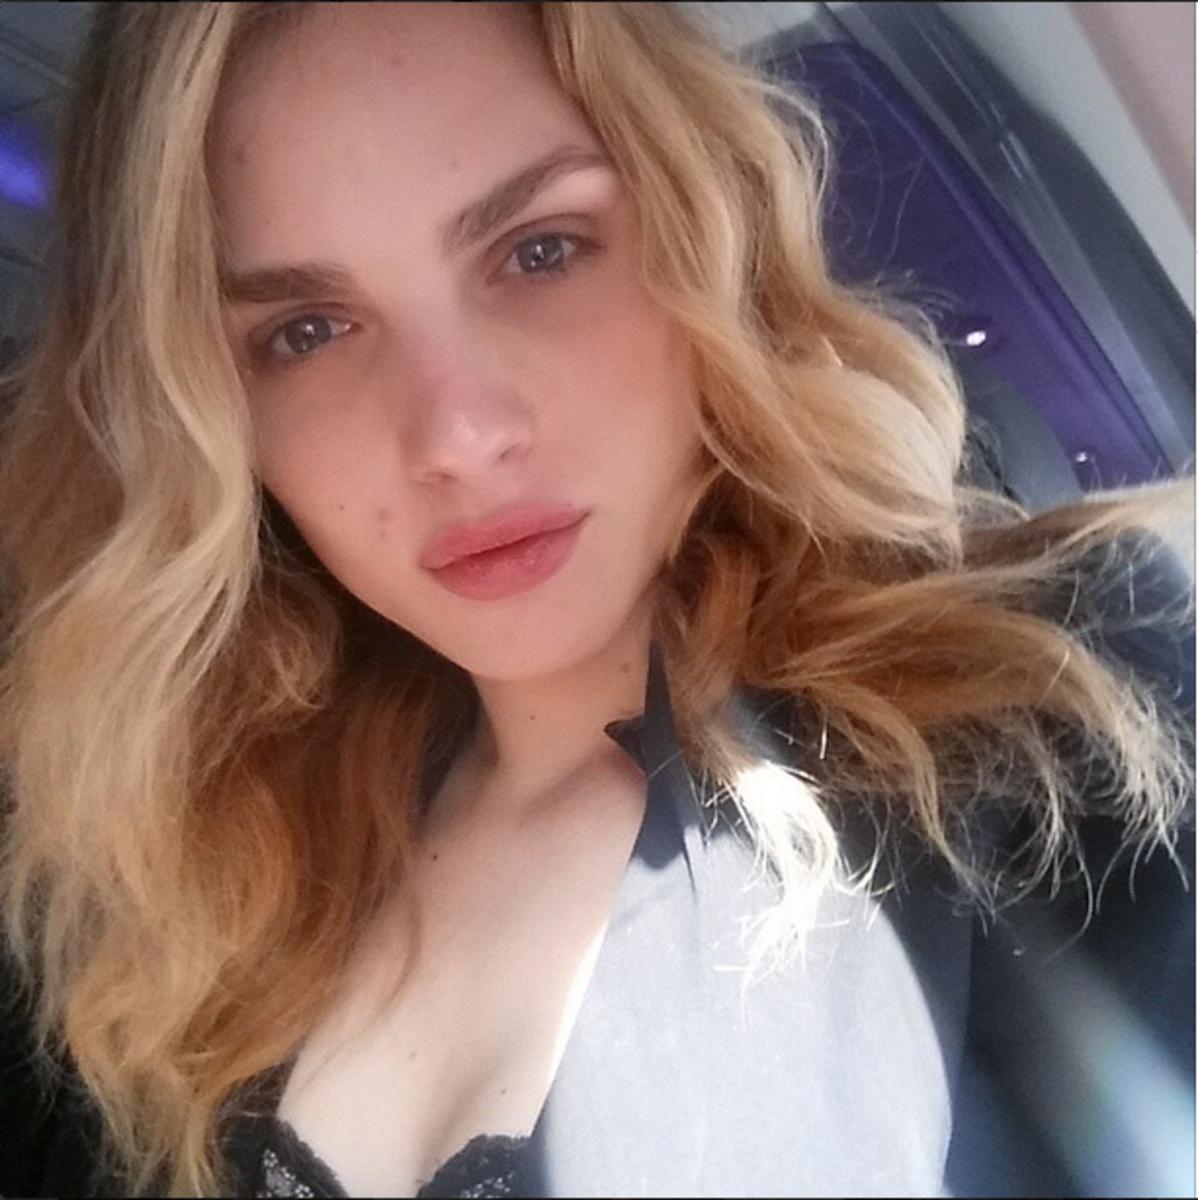 Andreja Pejic transgender model Instagram